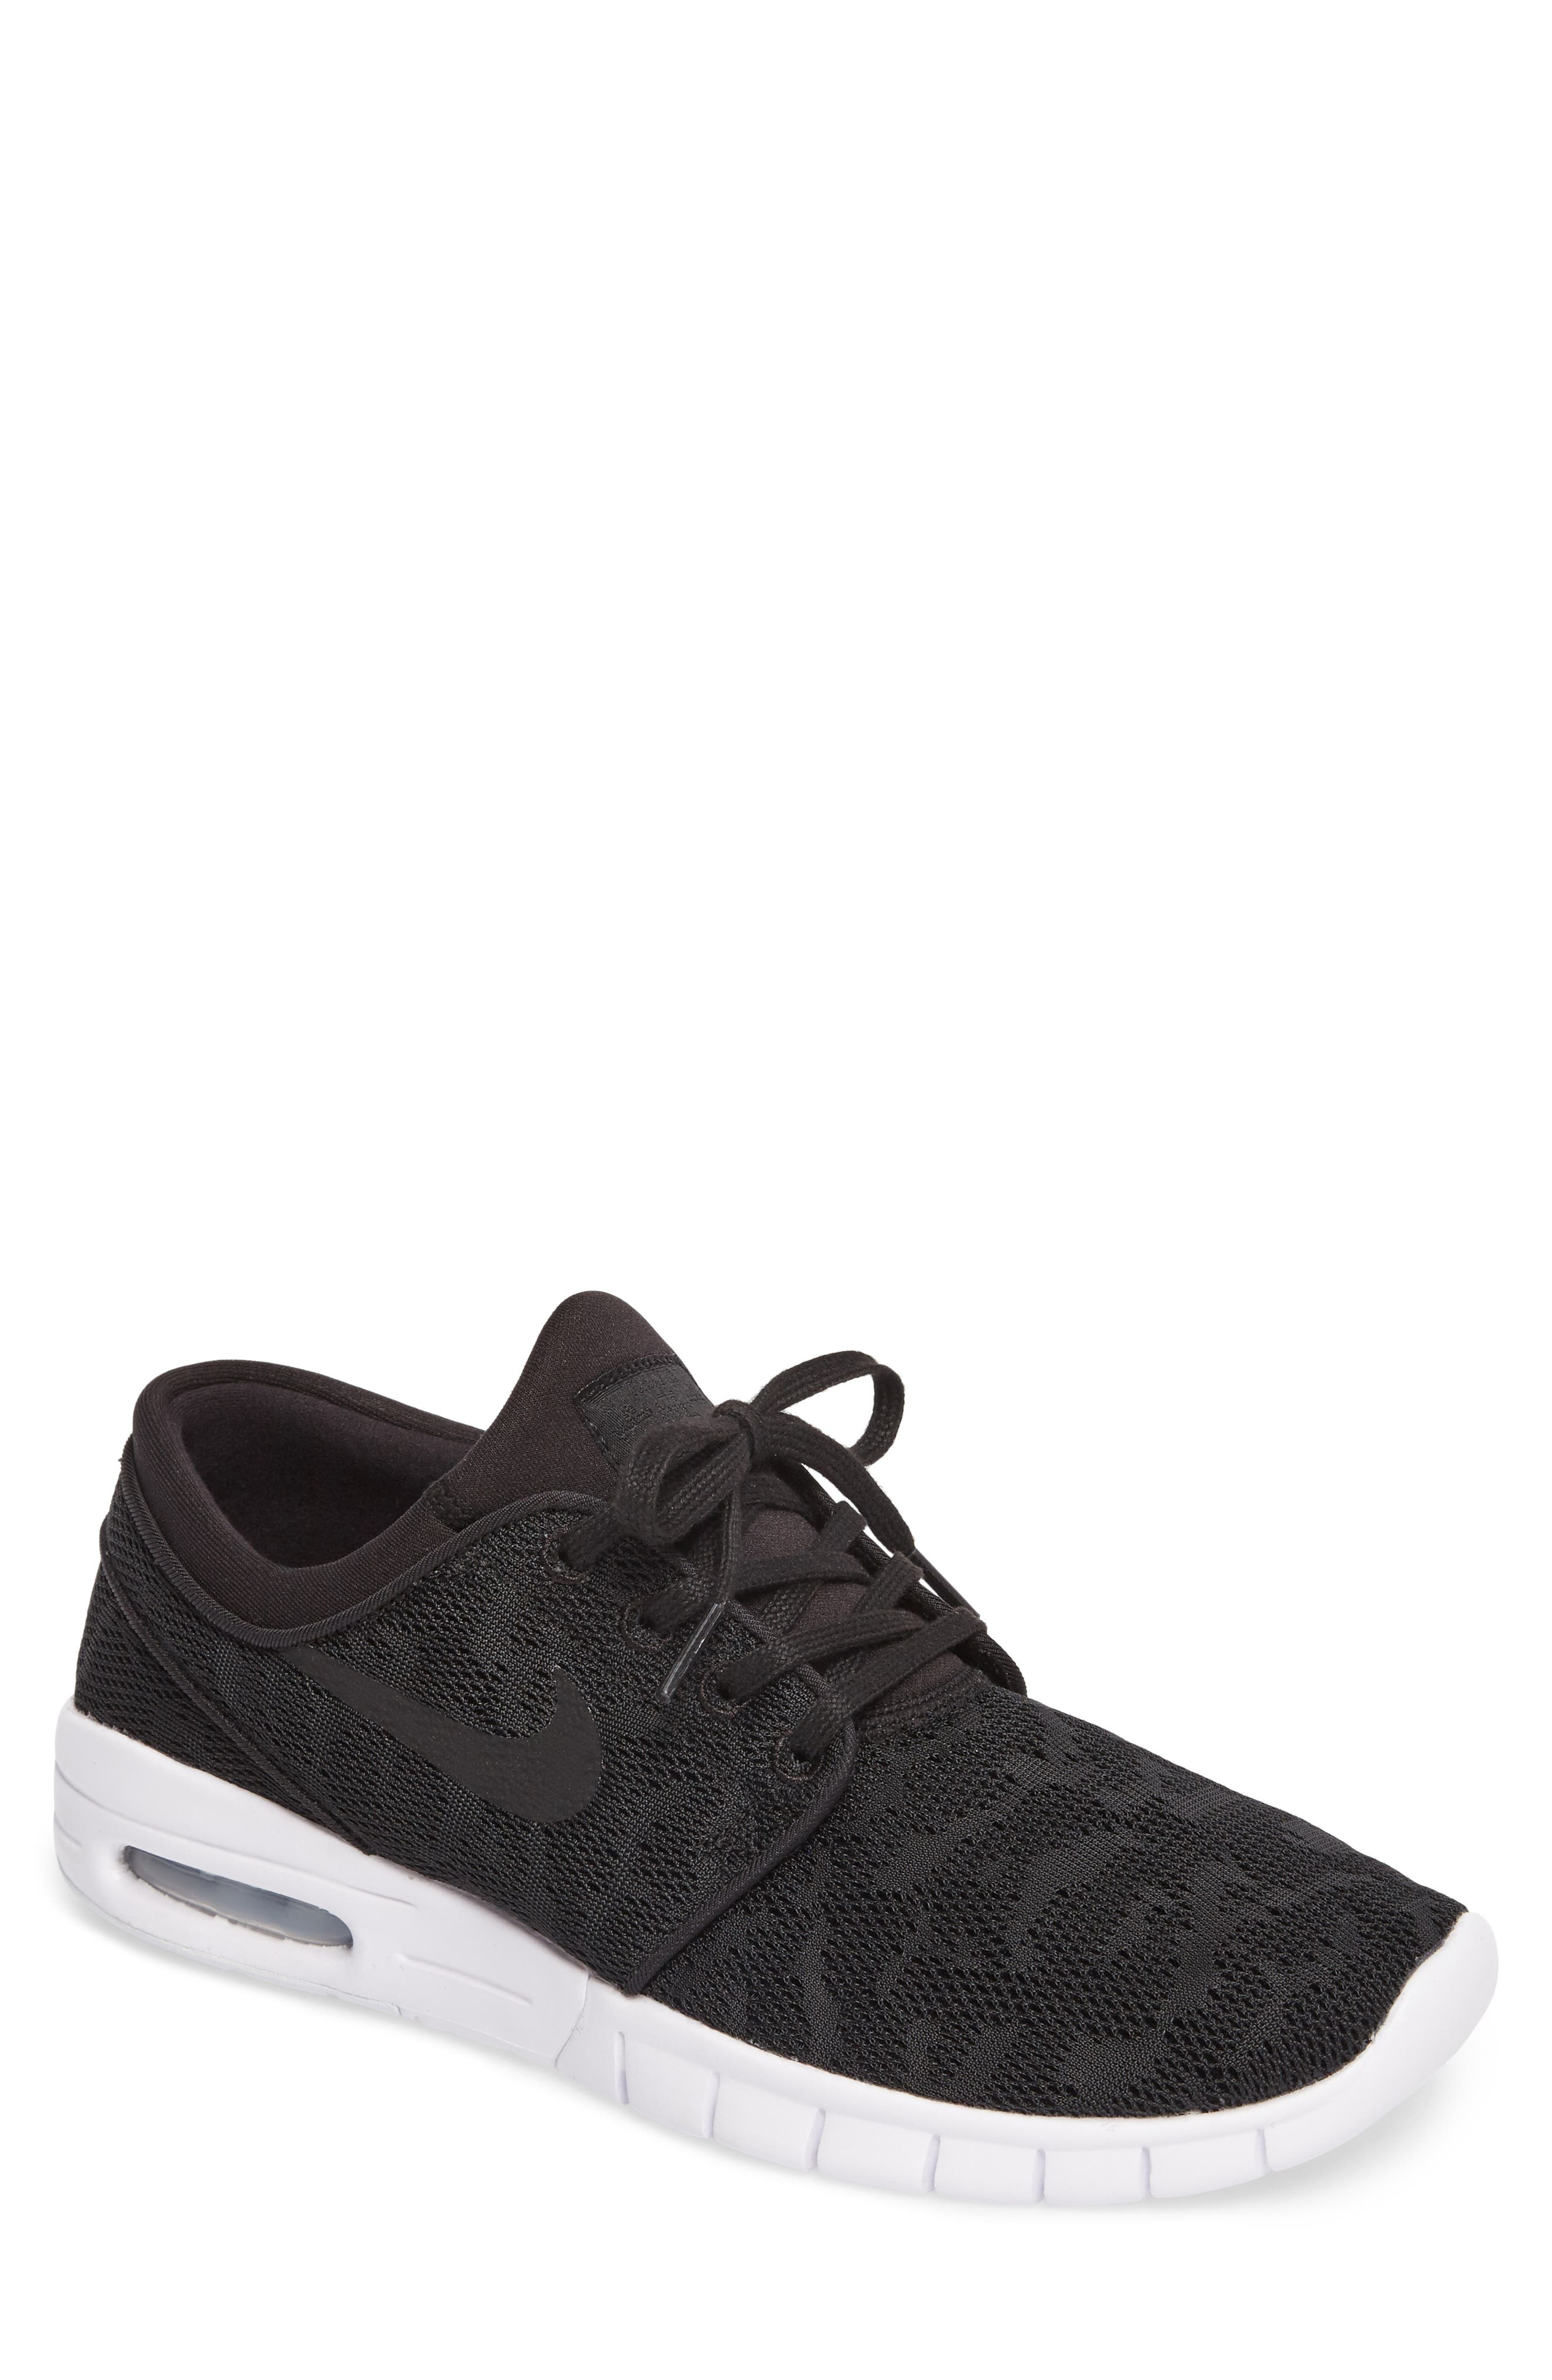 Alternate Image 1 Selected - Nike 'Stefan Janoski - Max SB' Skate Shoe (Men)